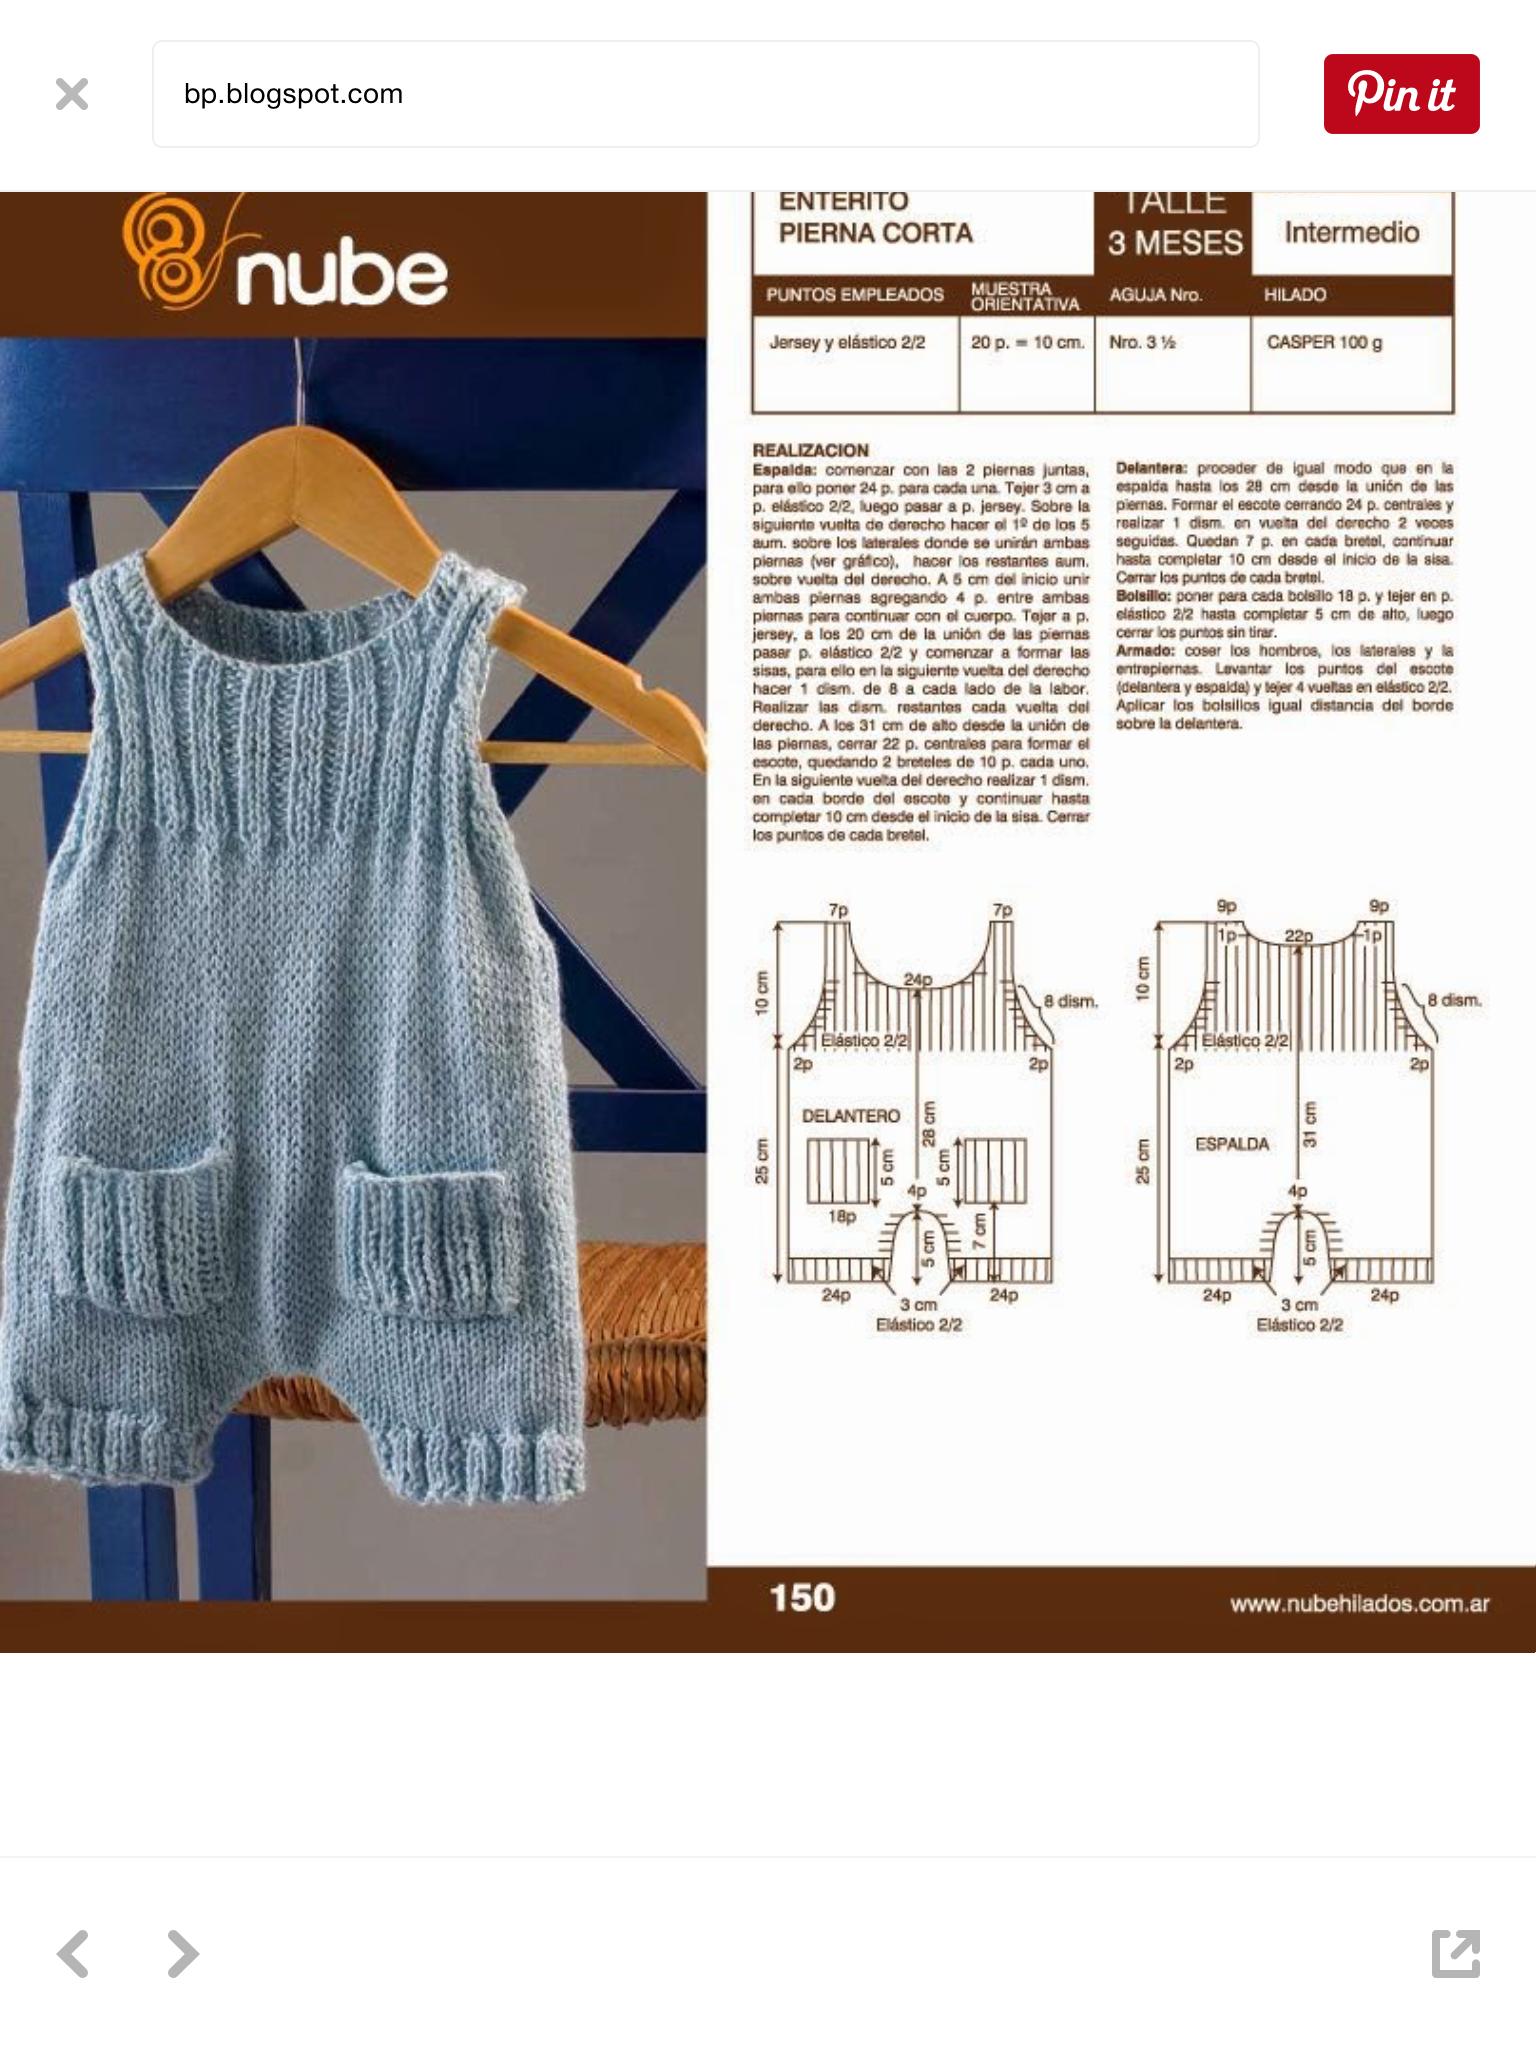 Pin de Lourdes Manriquez M en Bebés, niños, niñas | Pinterest | Bebe ...